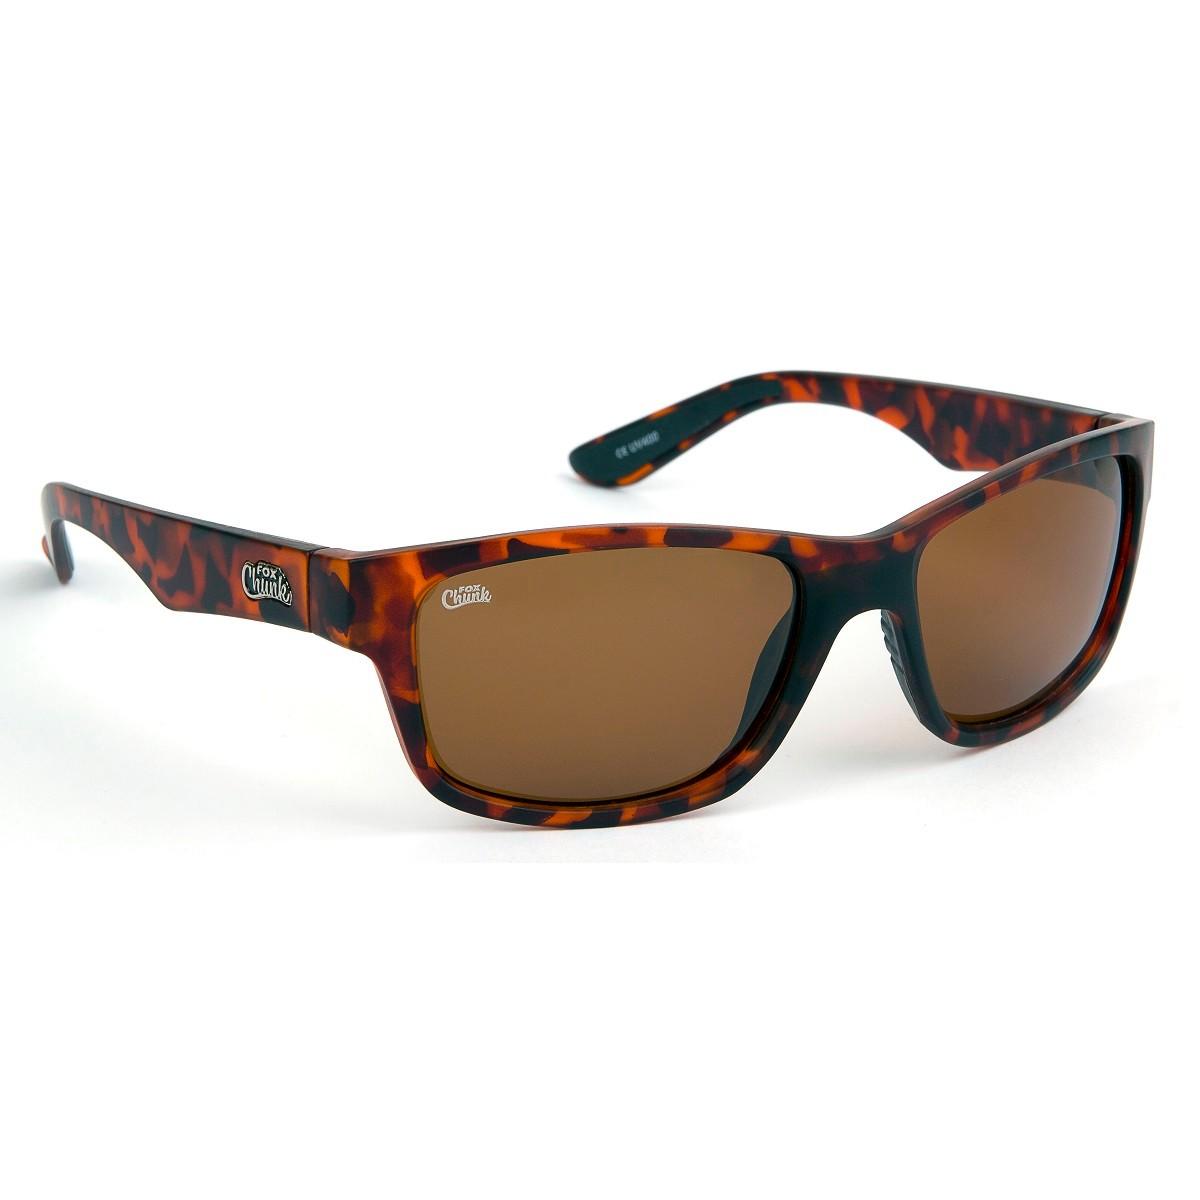 Очила Fox Chunk Tortoise Frame/Brown Lens Sunglasses